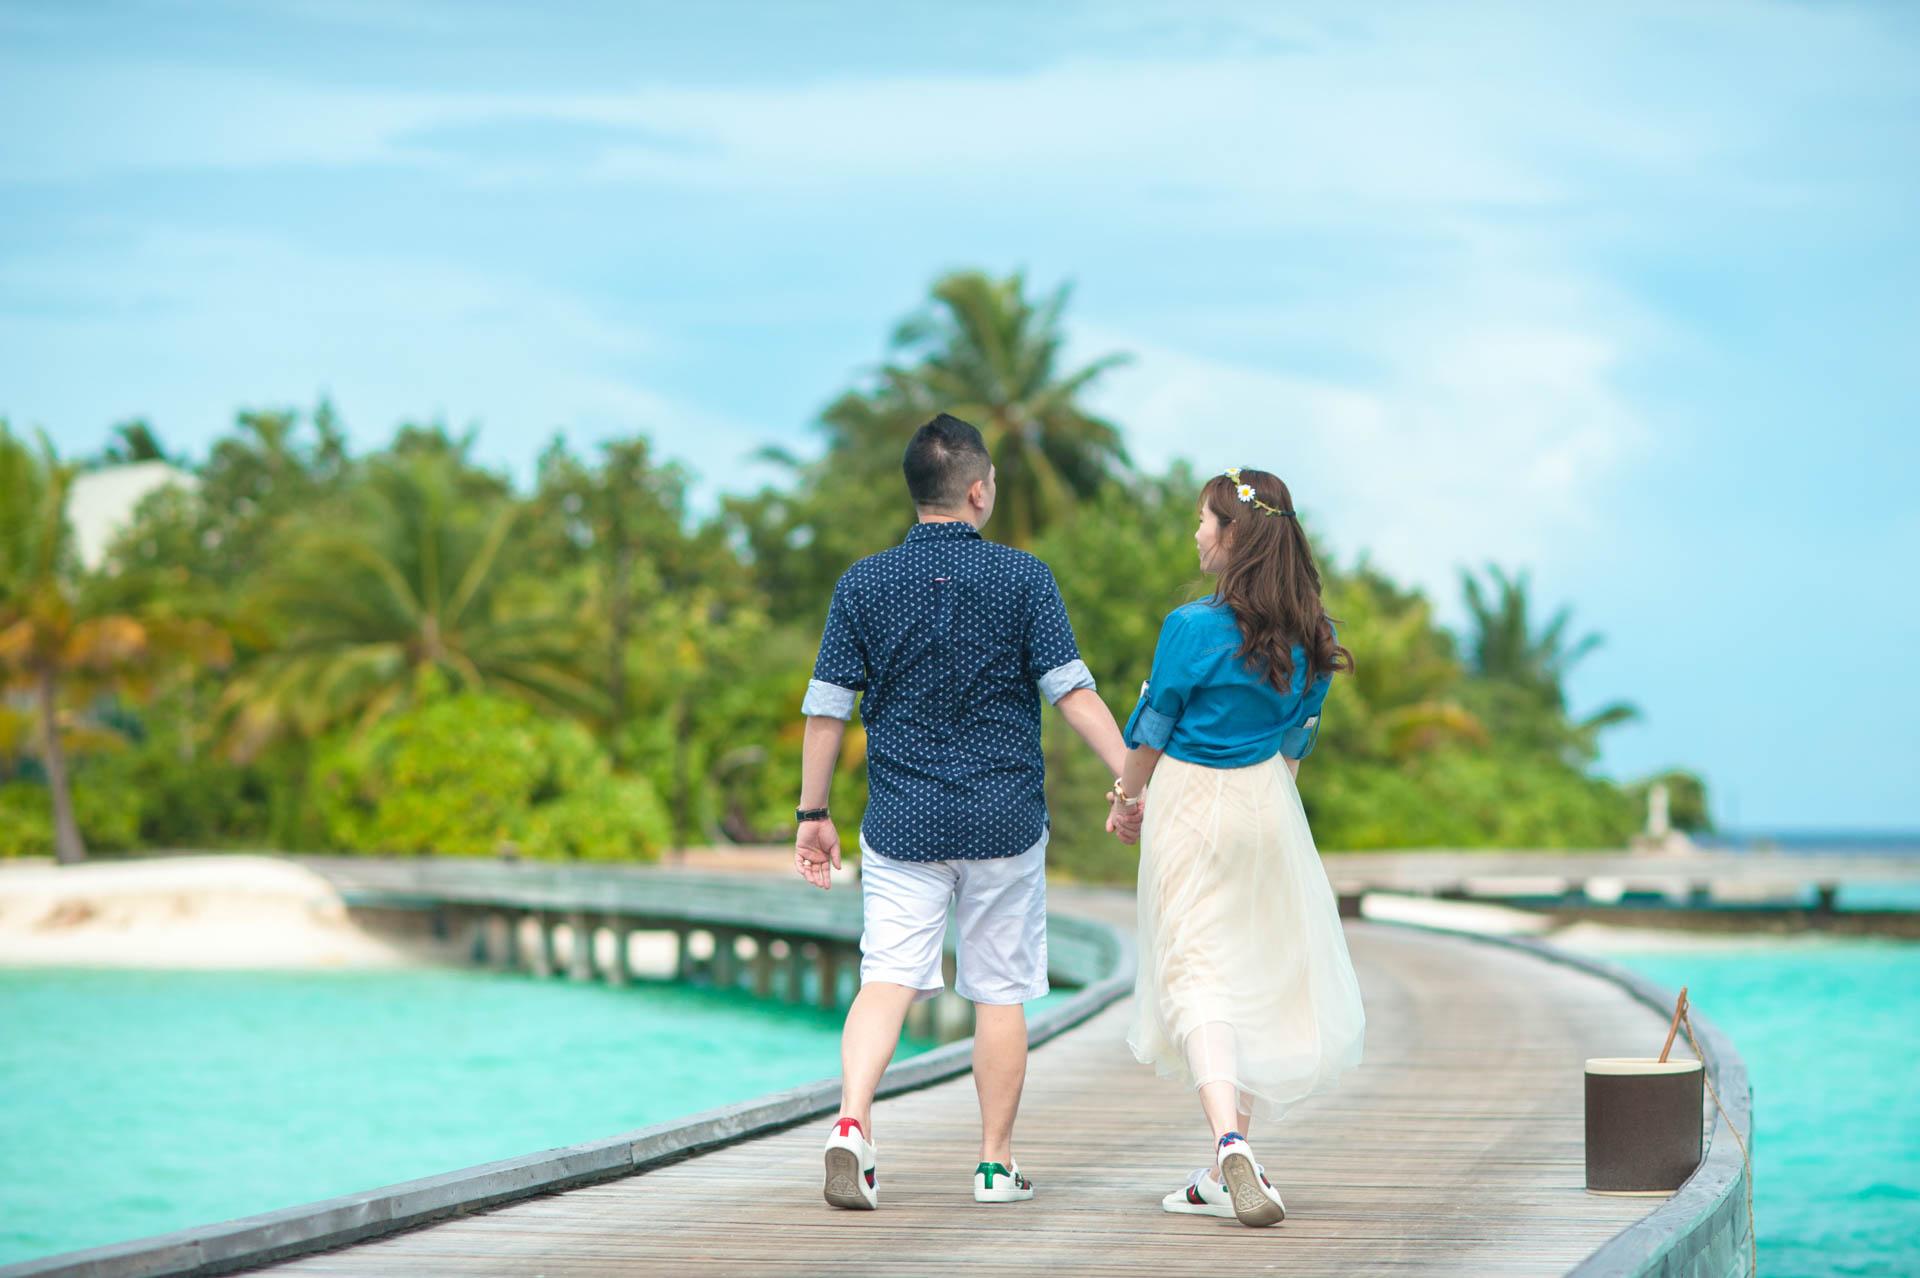 Chin Siew and Chin Yee Honeymoon in Maldives at Huvafen Fushi Resort Under Water Spa 36